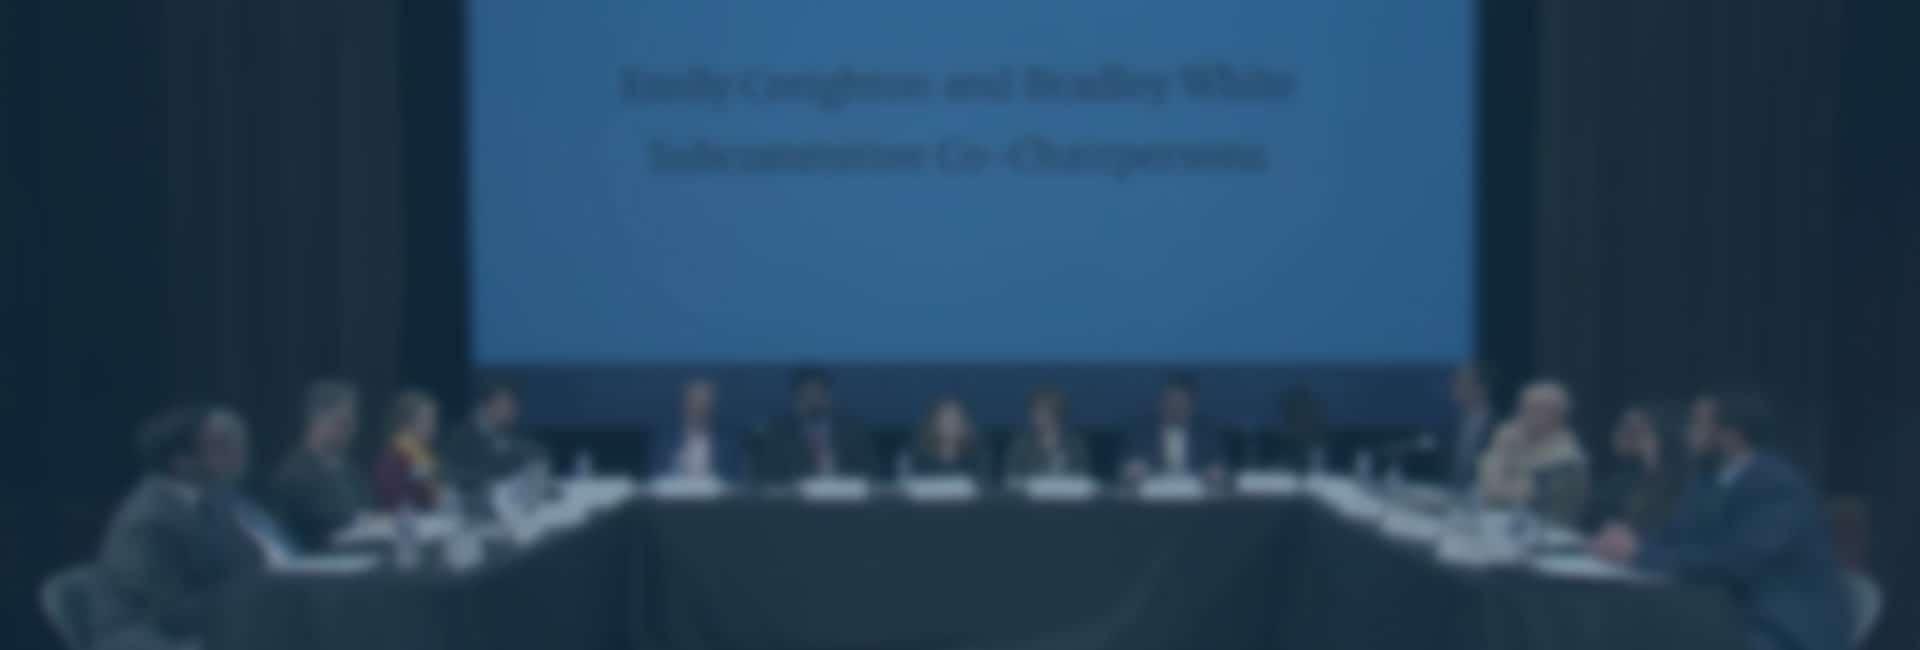 National FOIA Advisory Committee Meeting Recap – December 6, 2019